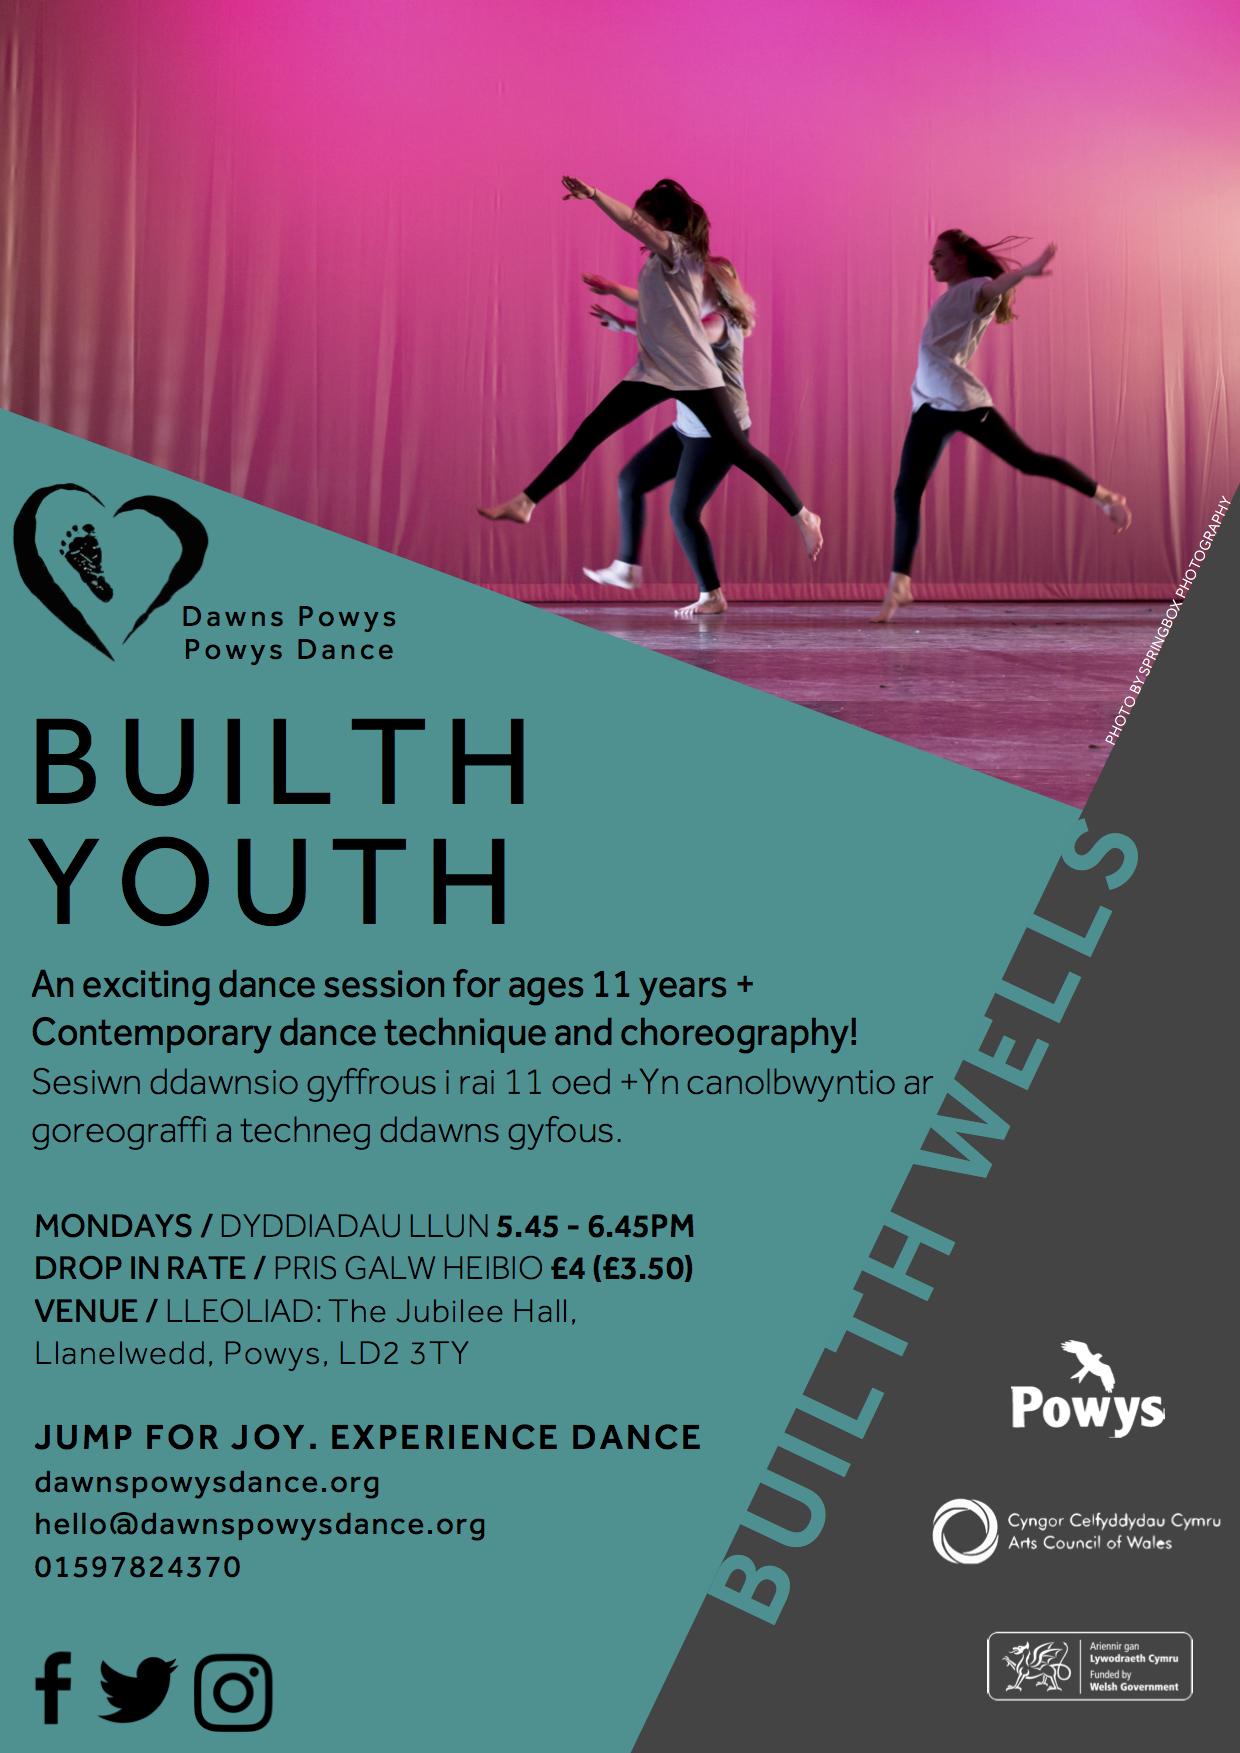 builth youth 2018.jpg